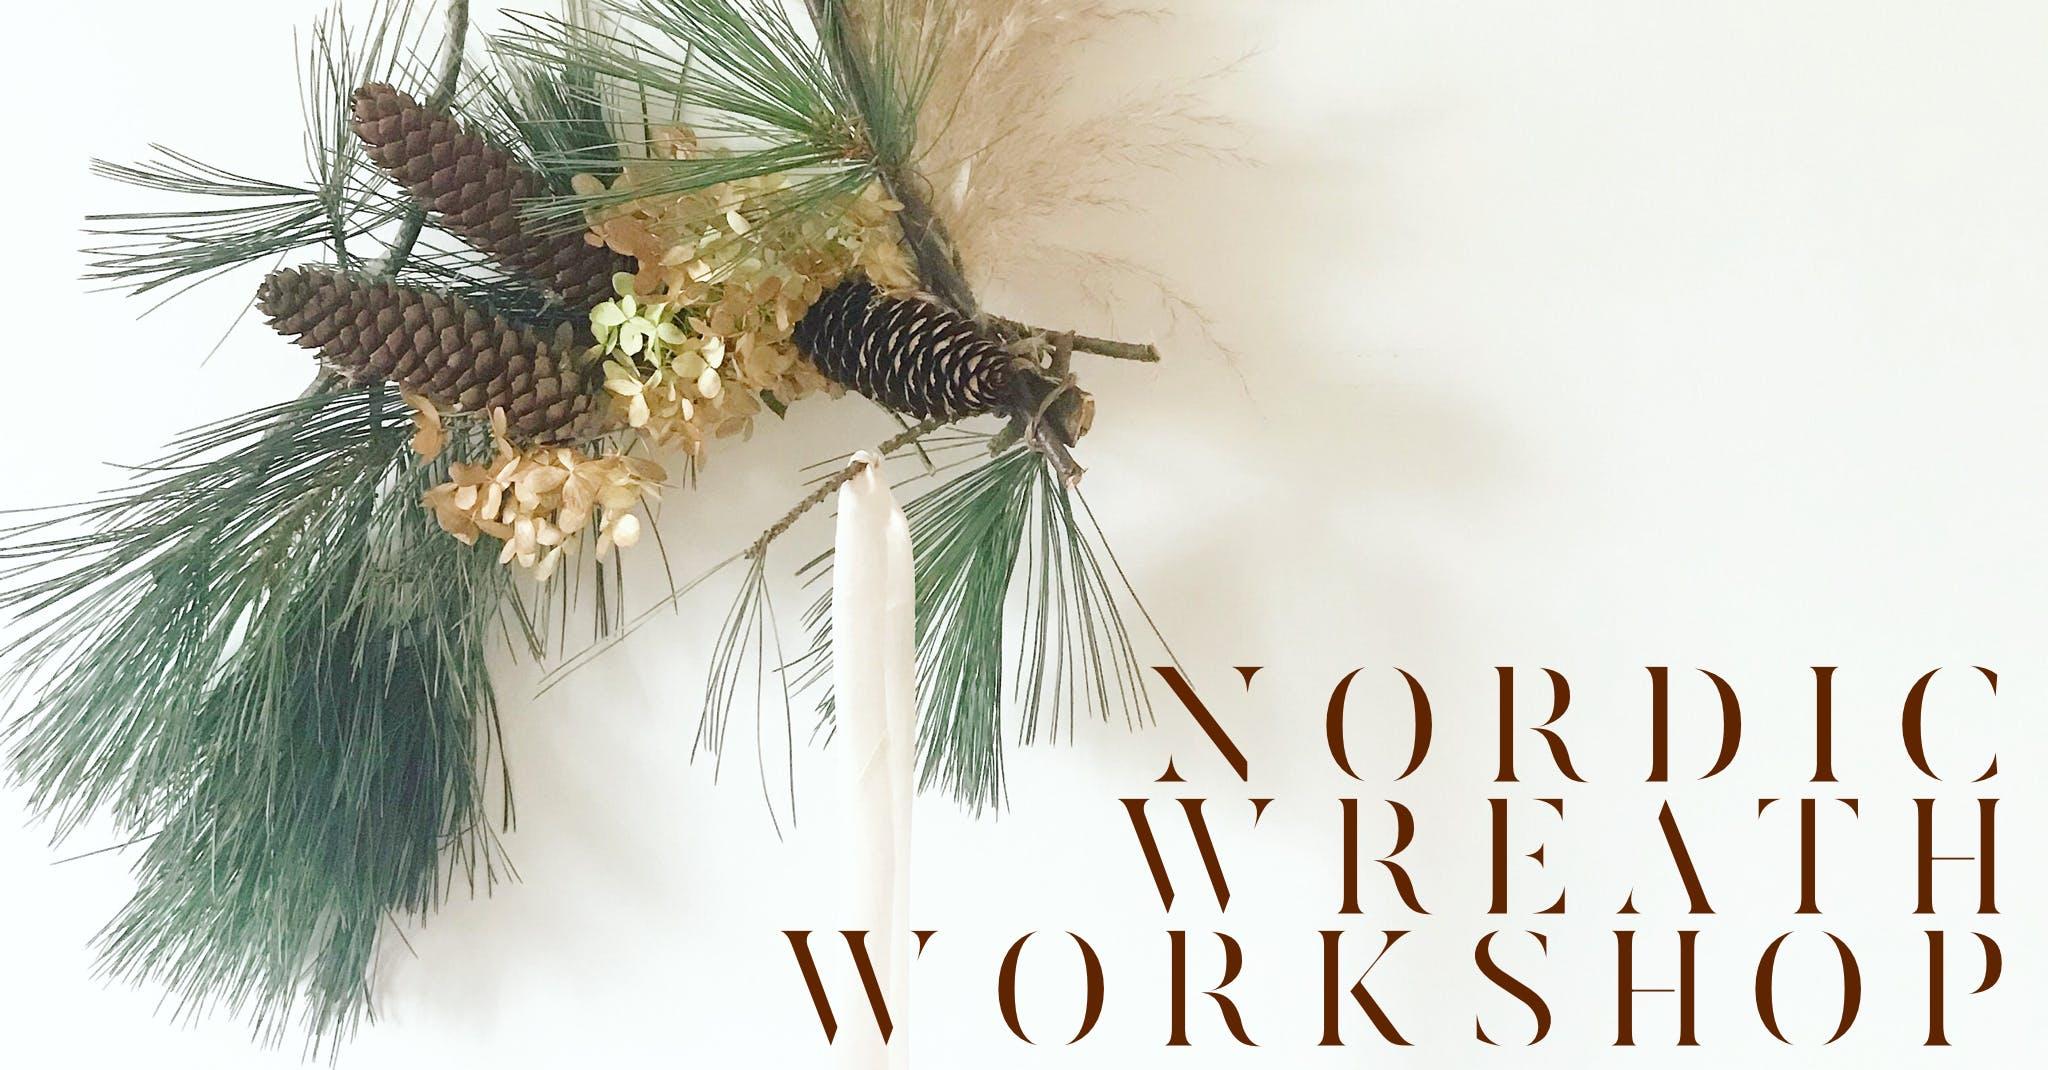 Nordic Wreath Workshop